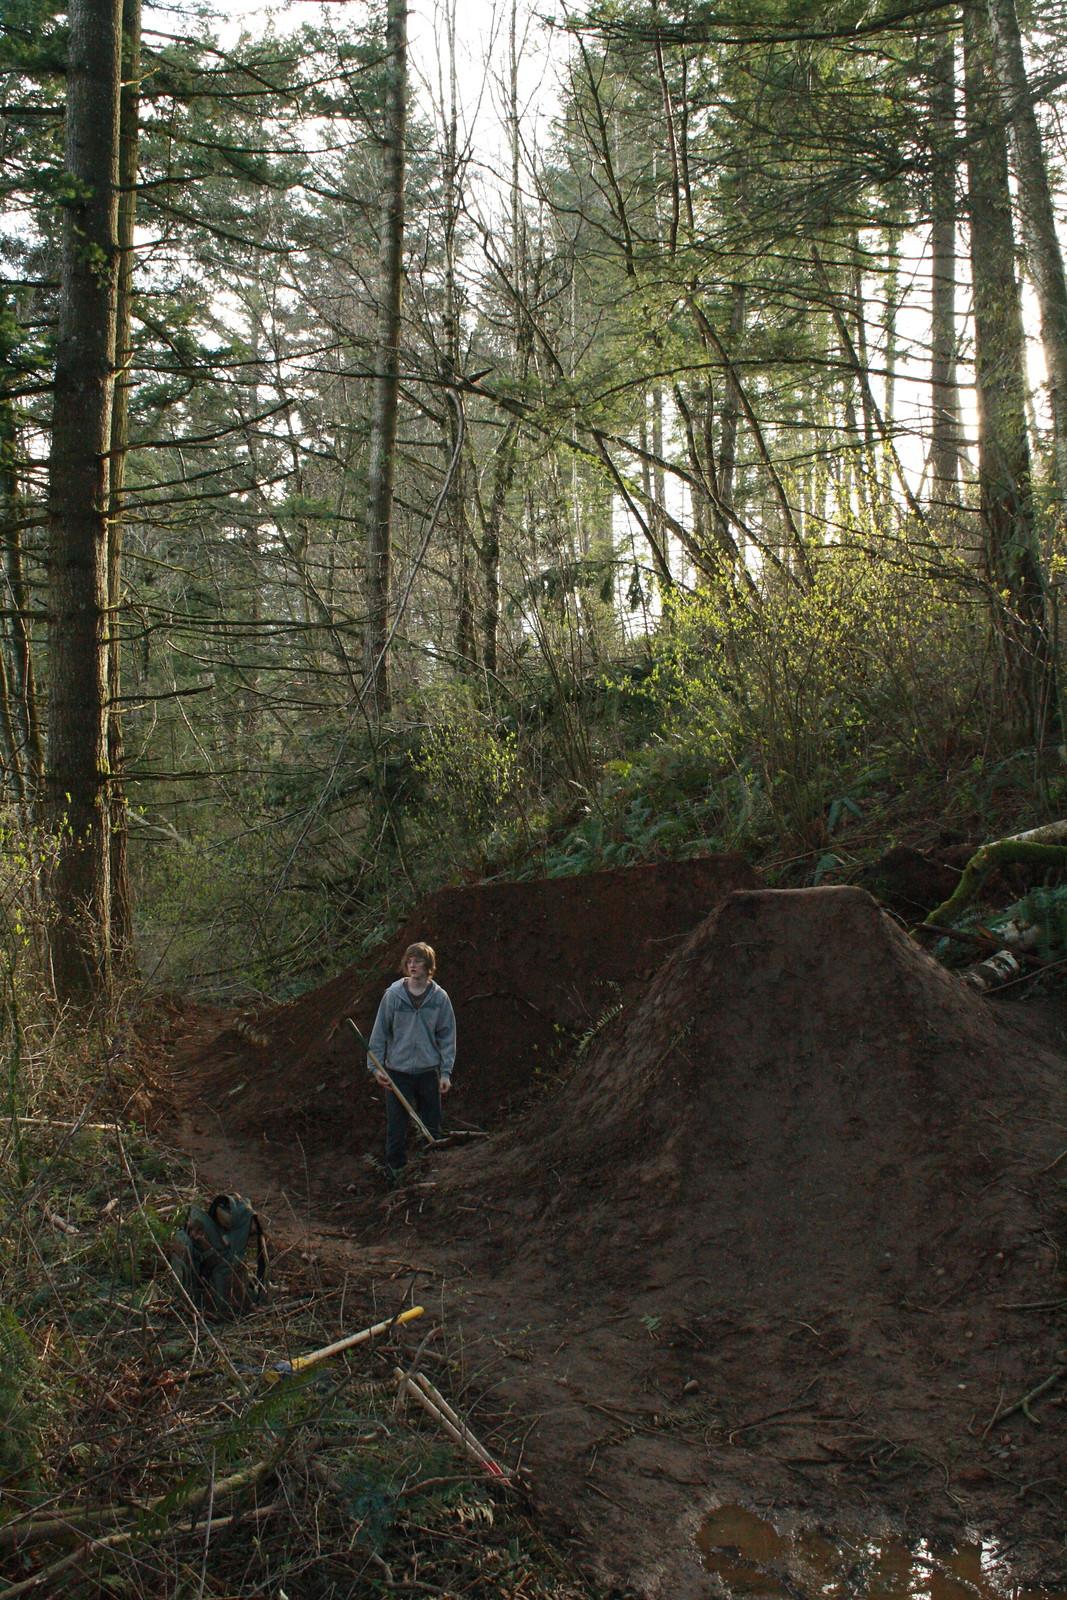 IMG_1548 - samhein - Mountain Biking Pictures - Vital MTB